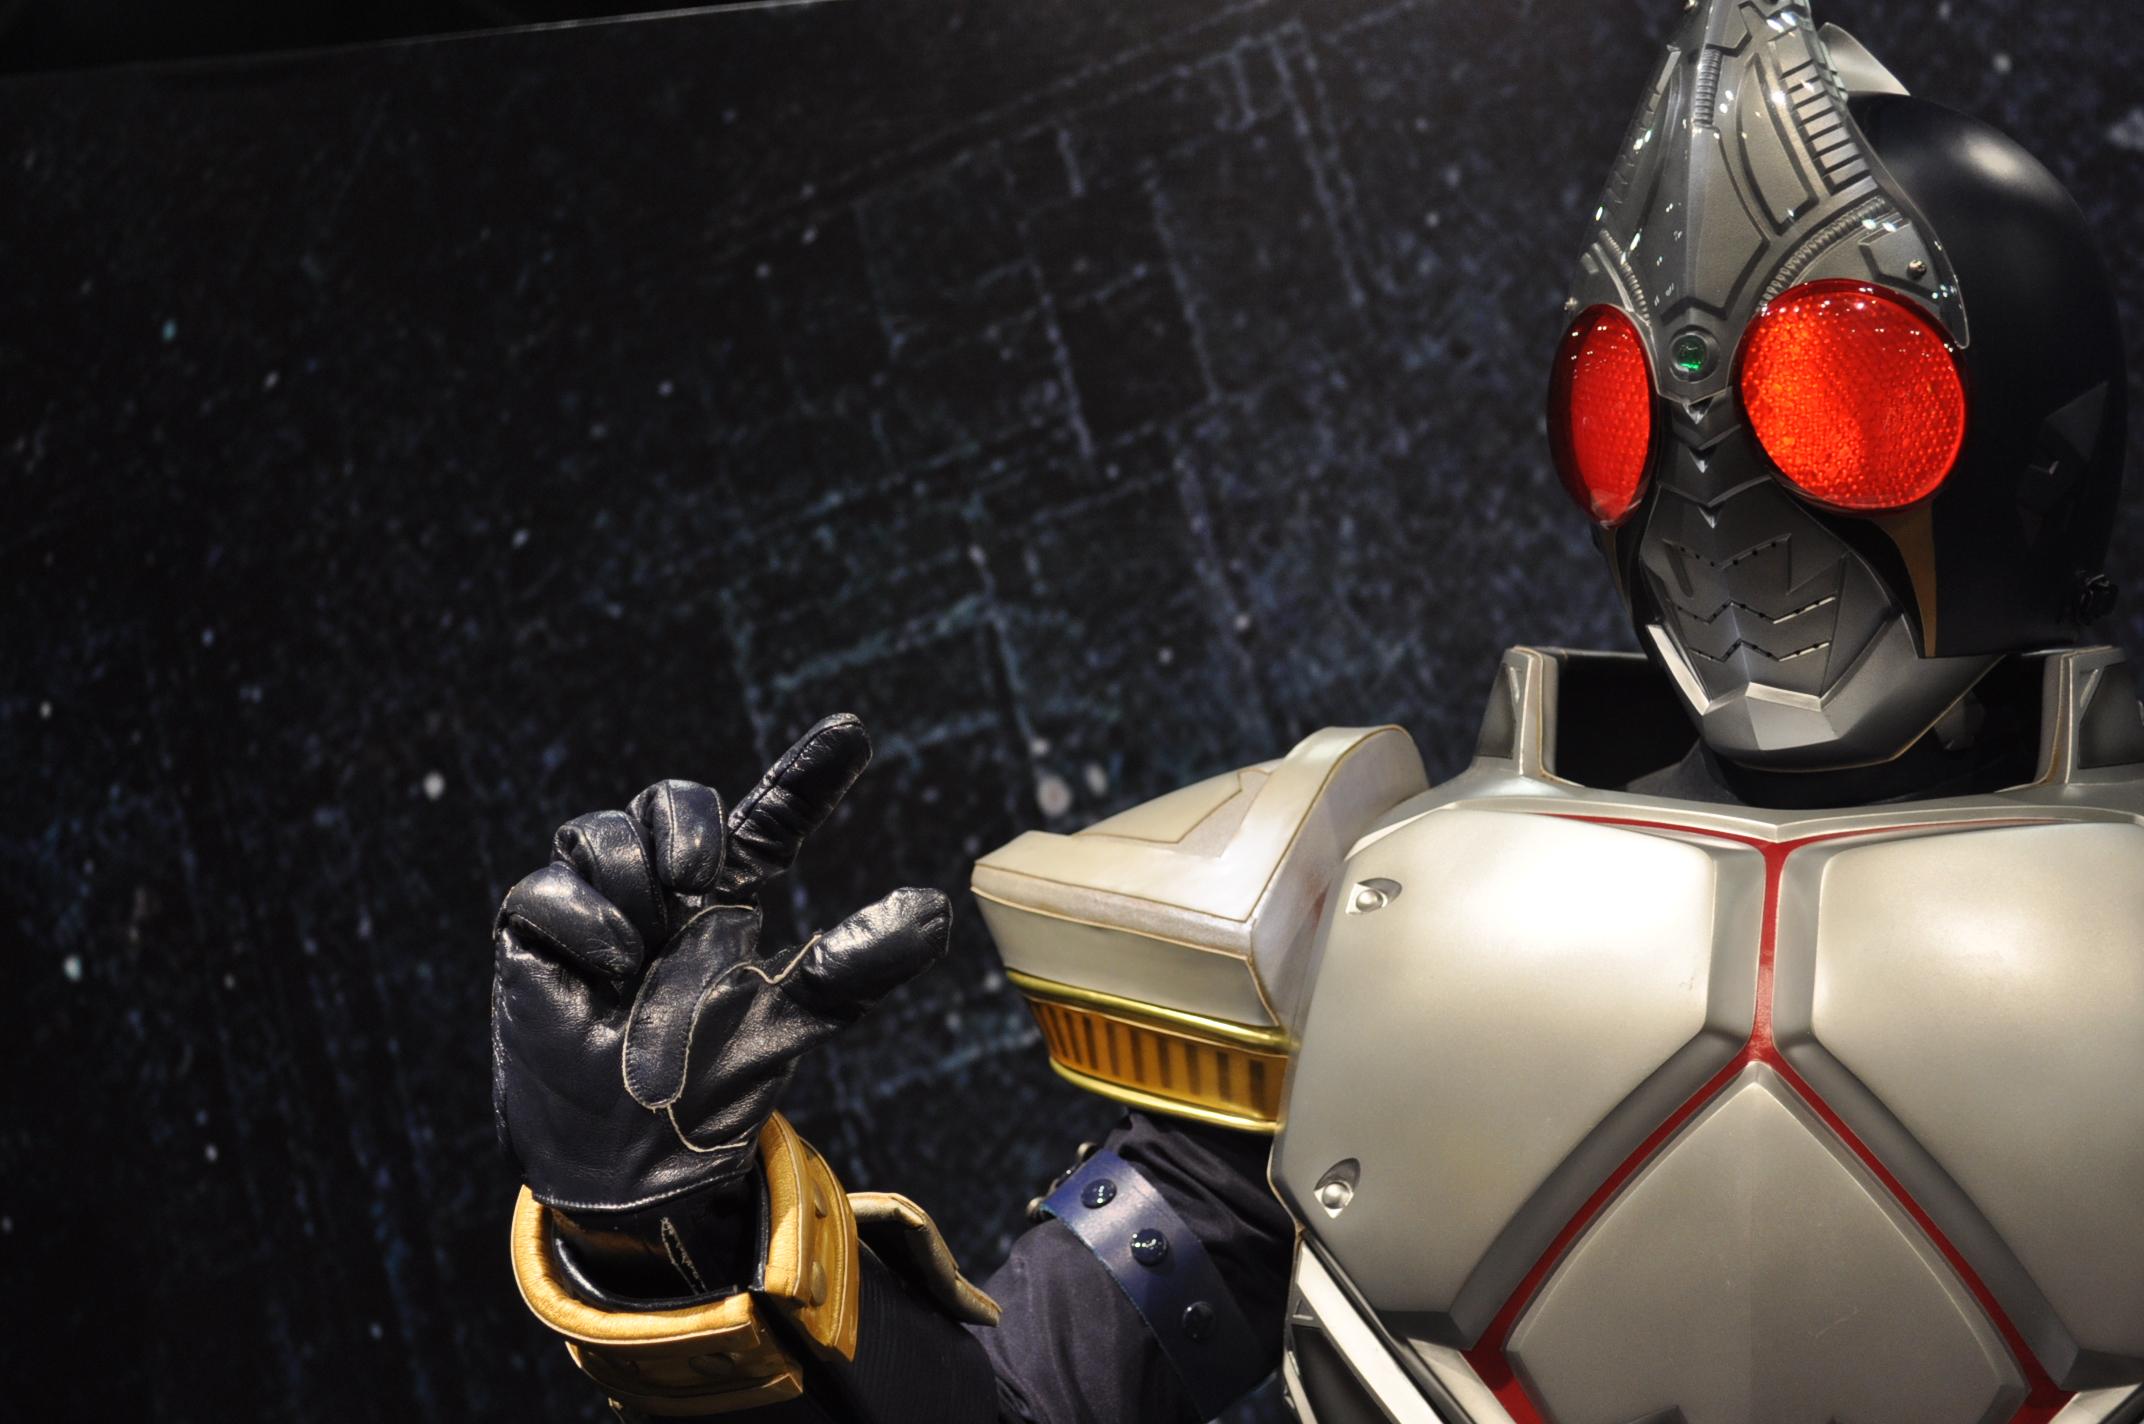 Download 680+ Wallpaper Hd Kamen Rider Gratis